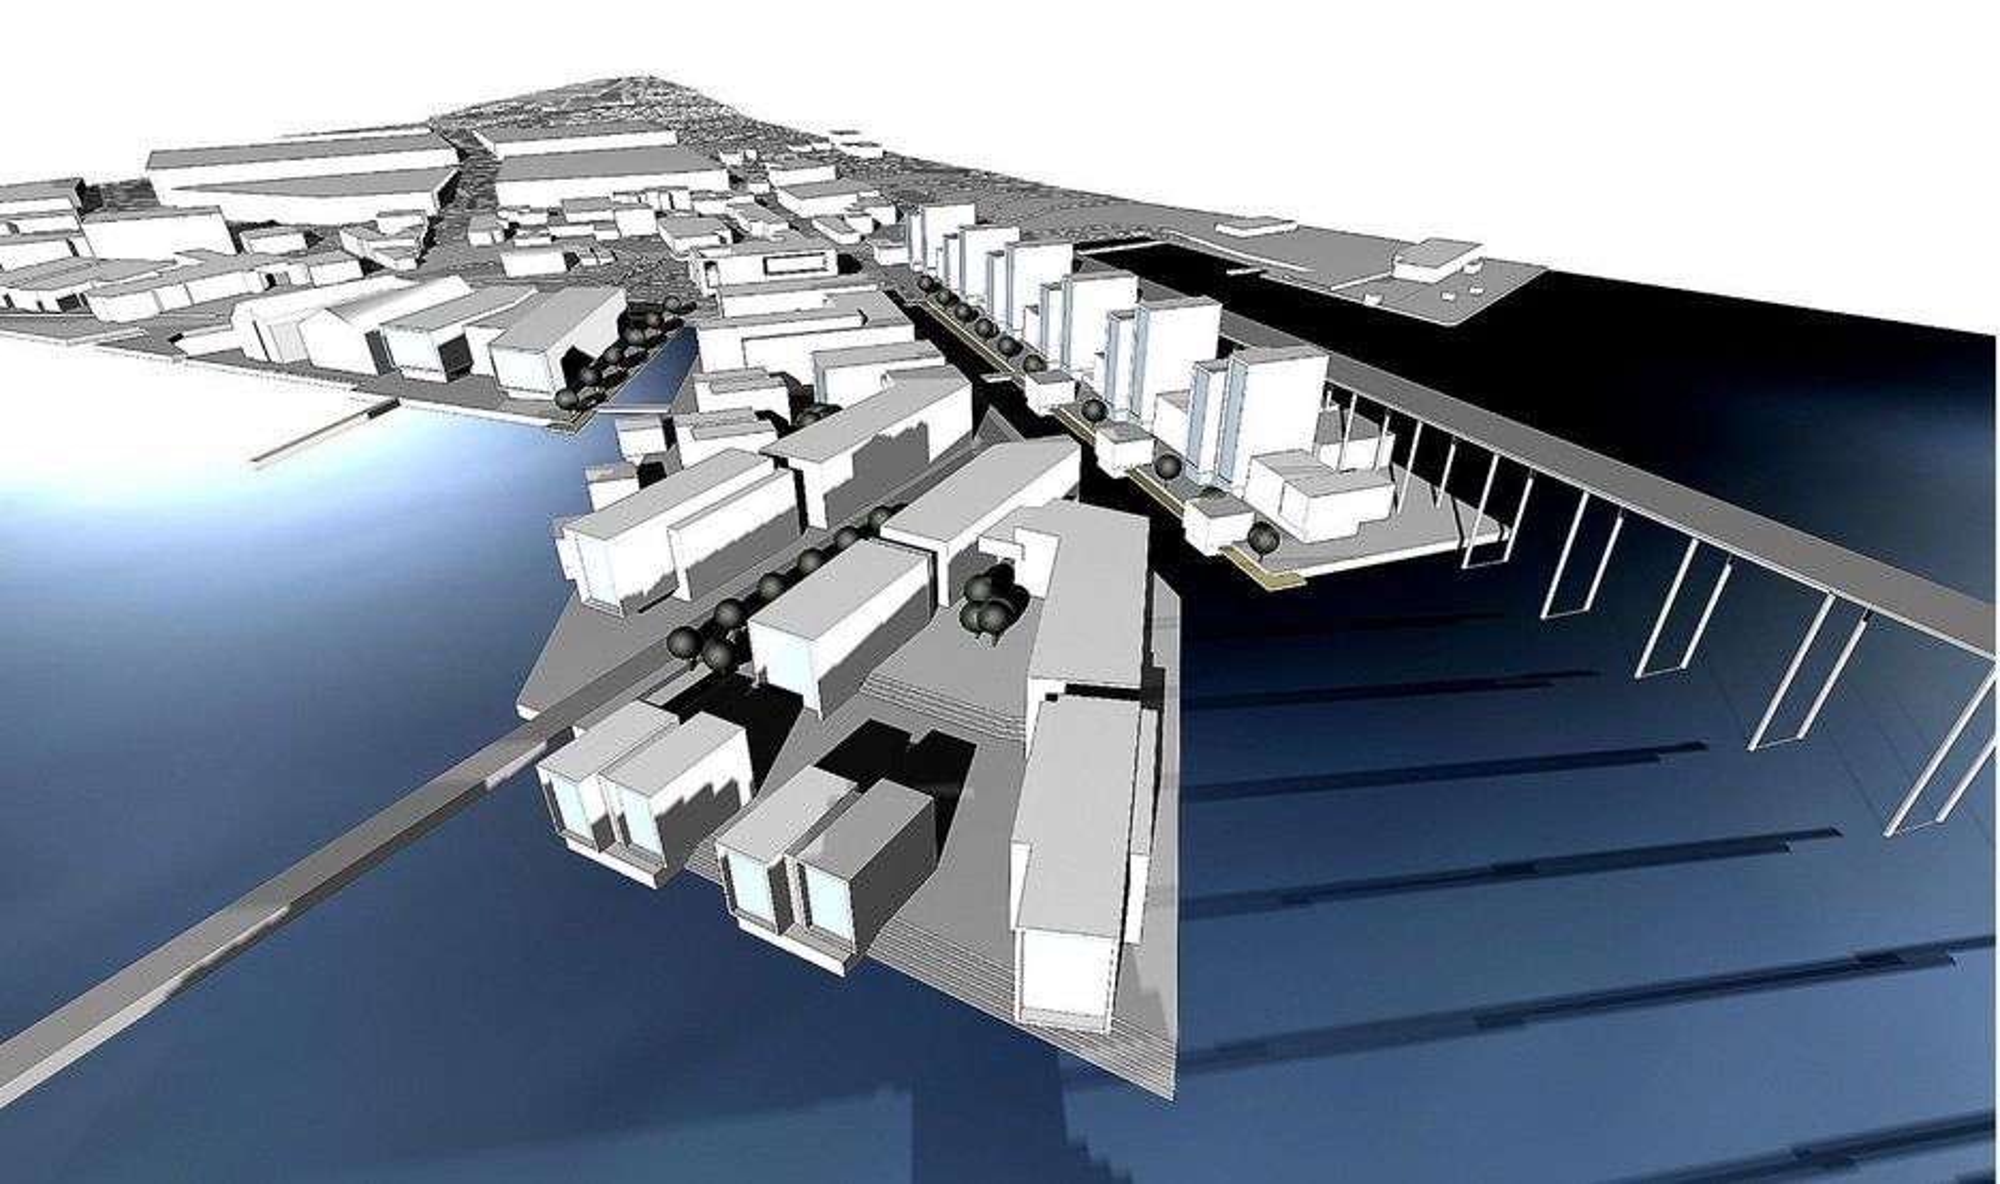 SKIPSVERFTSTOMT: I Tromsø skal det bygges boliger like ved den karakteristiske Tromsøbrua.